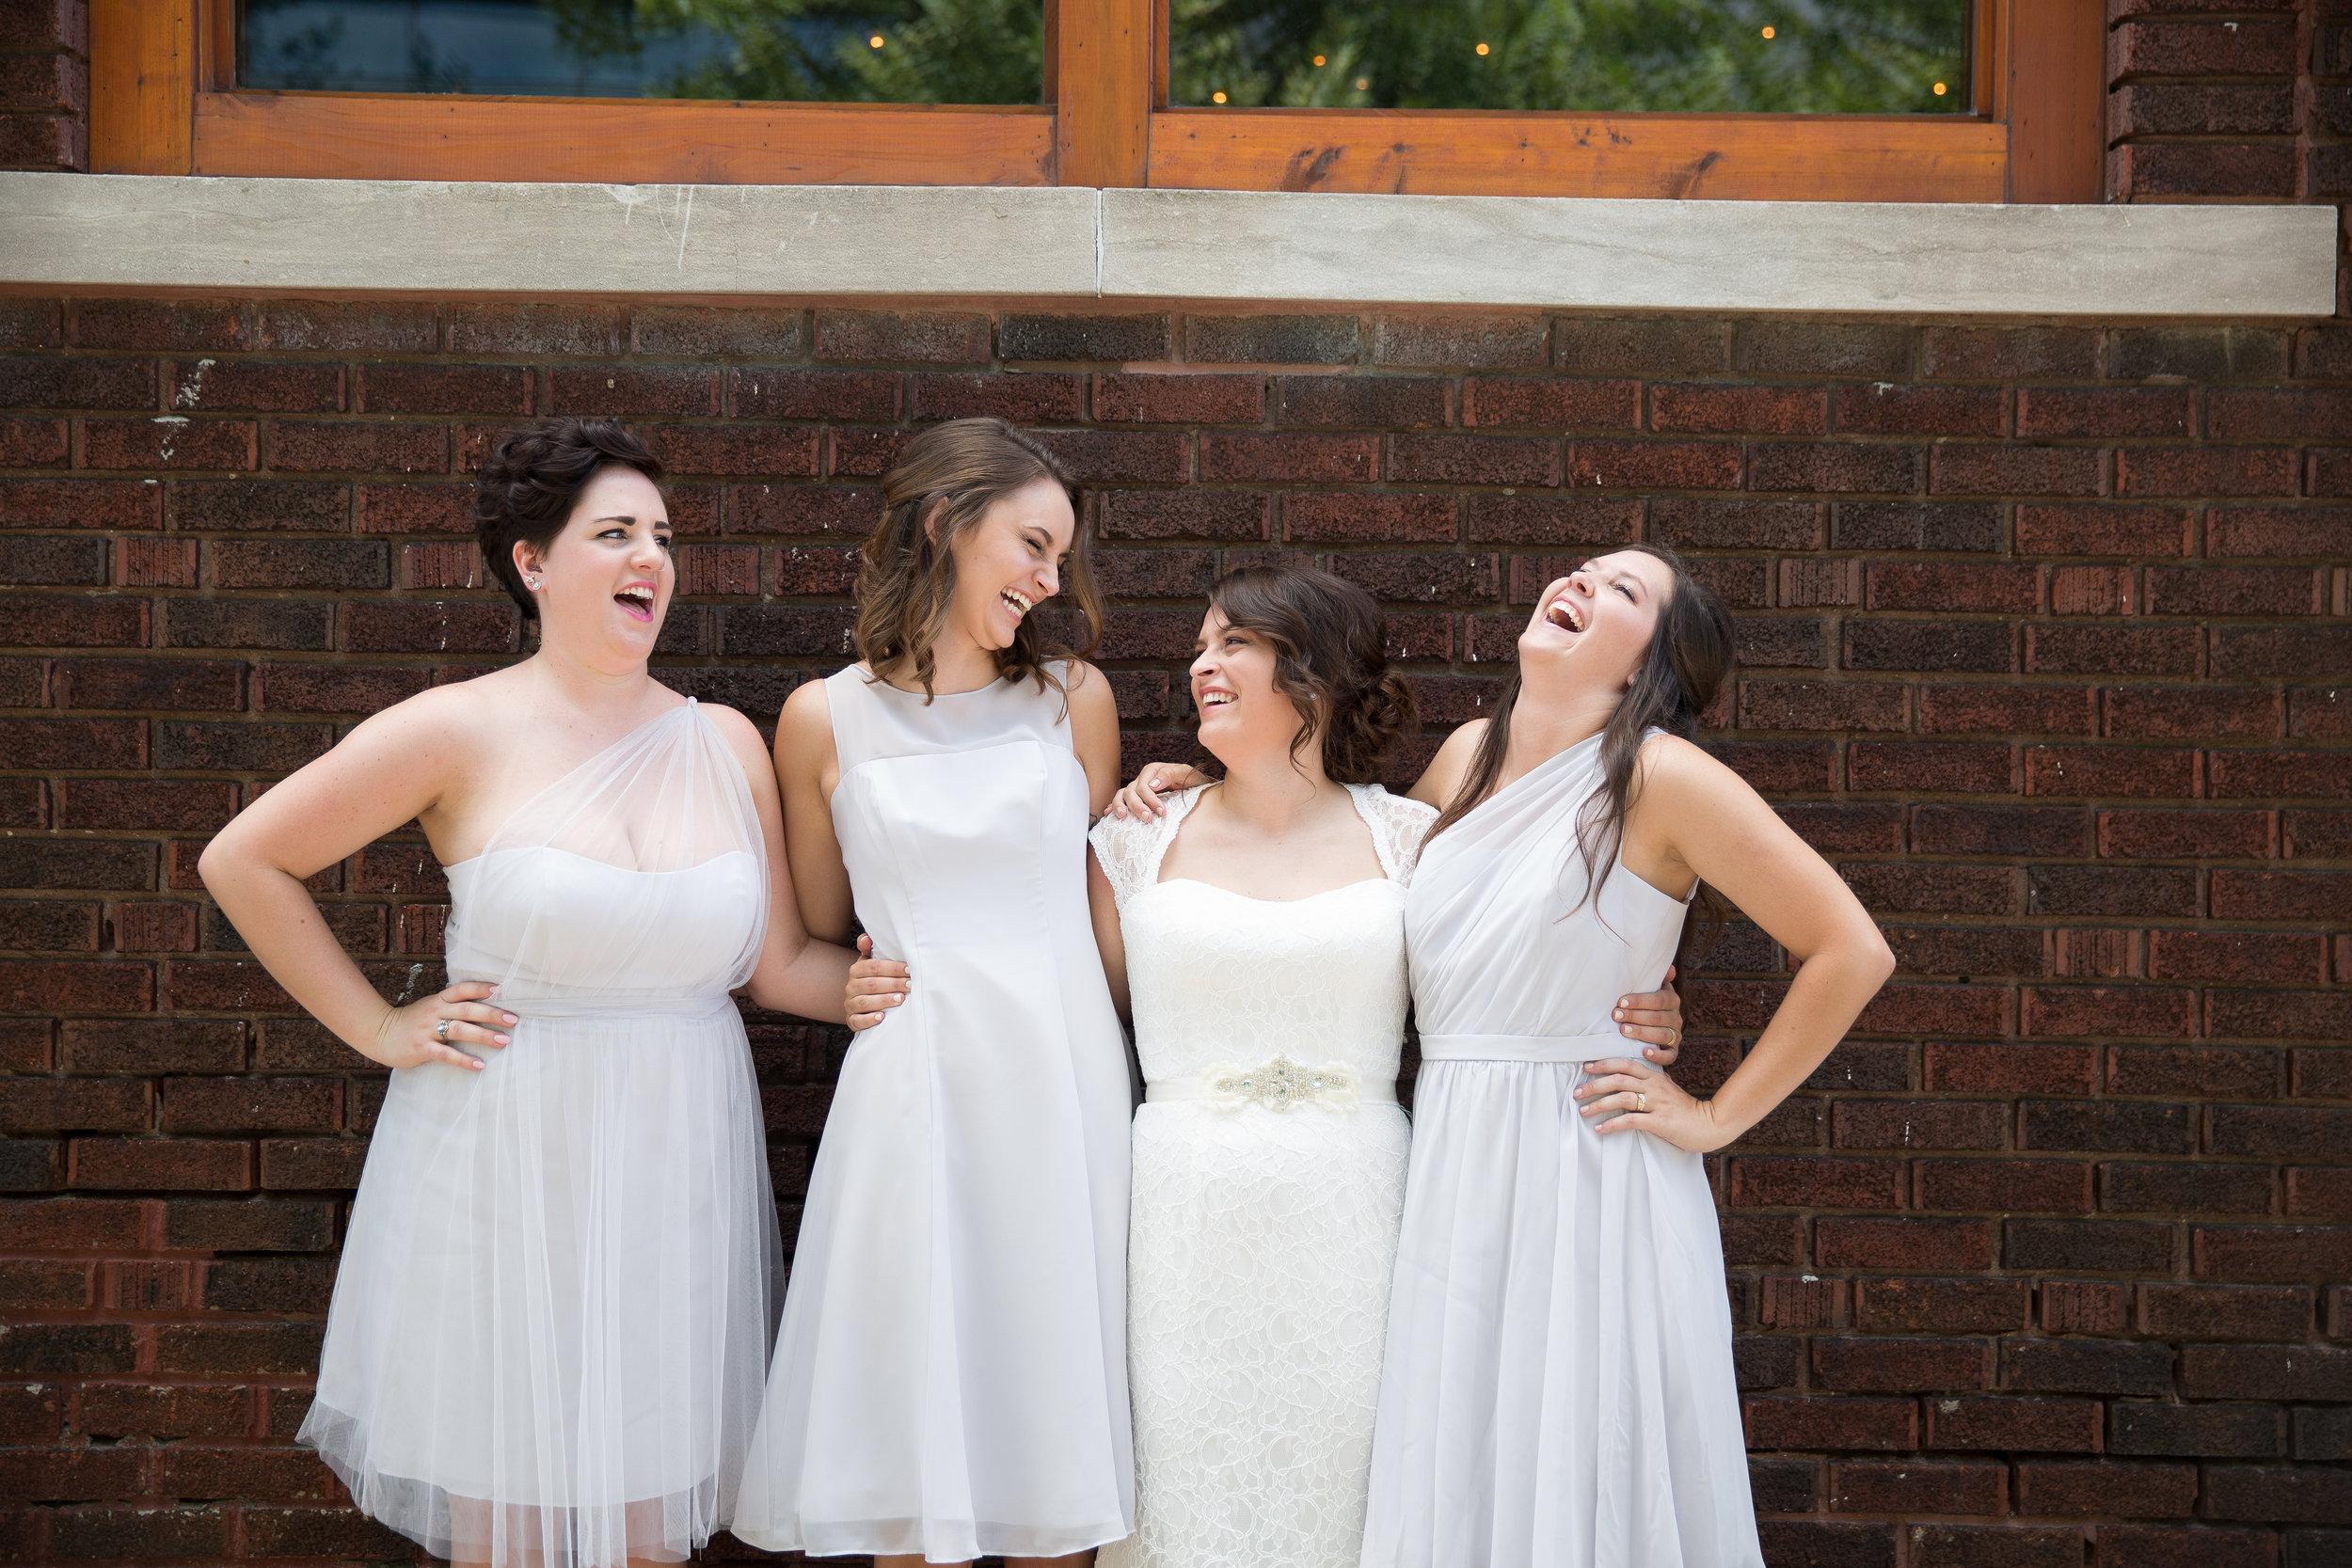 Kansas+City_Small+Wedding_Elope_Intimate_Ceremony_Best+Friends_39.jpg